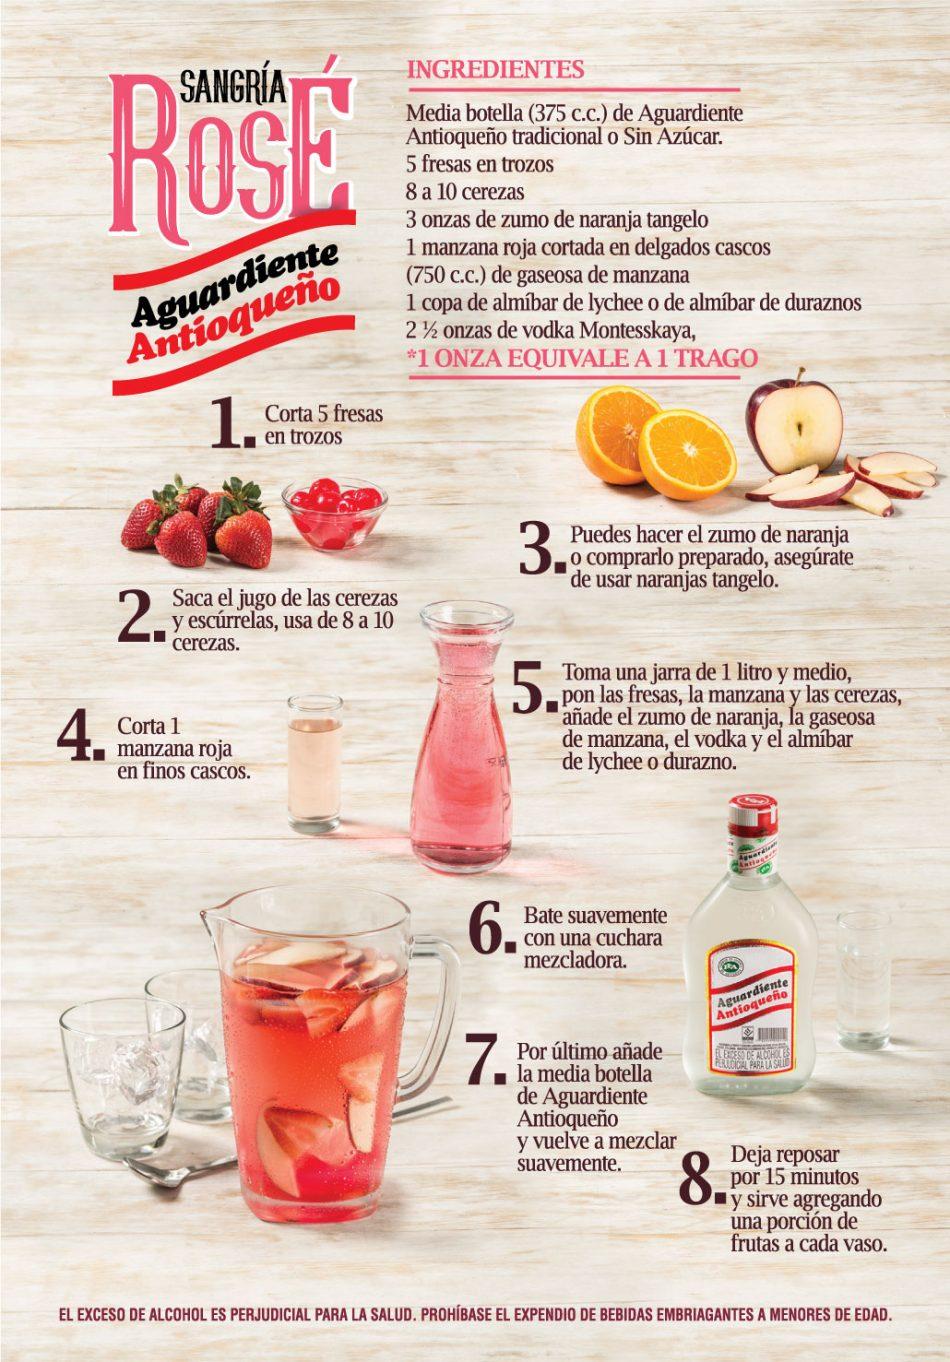 receta sangria rose